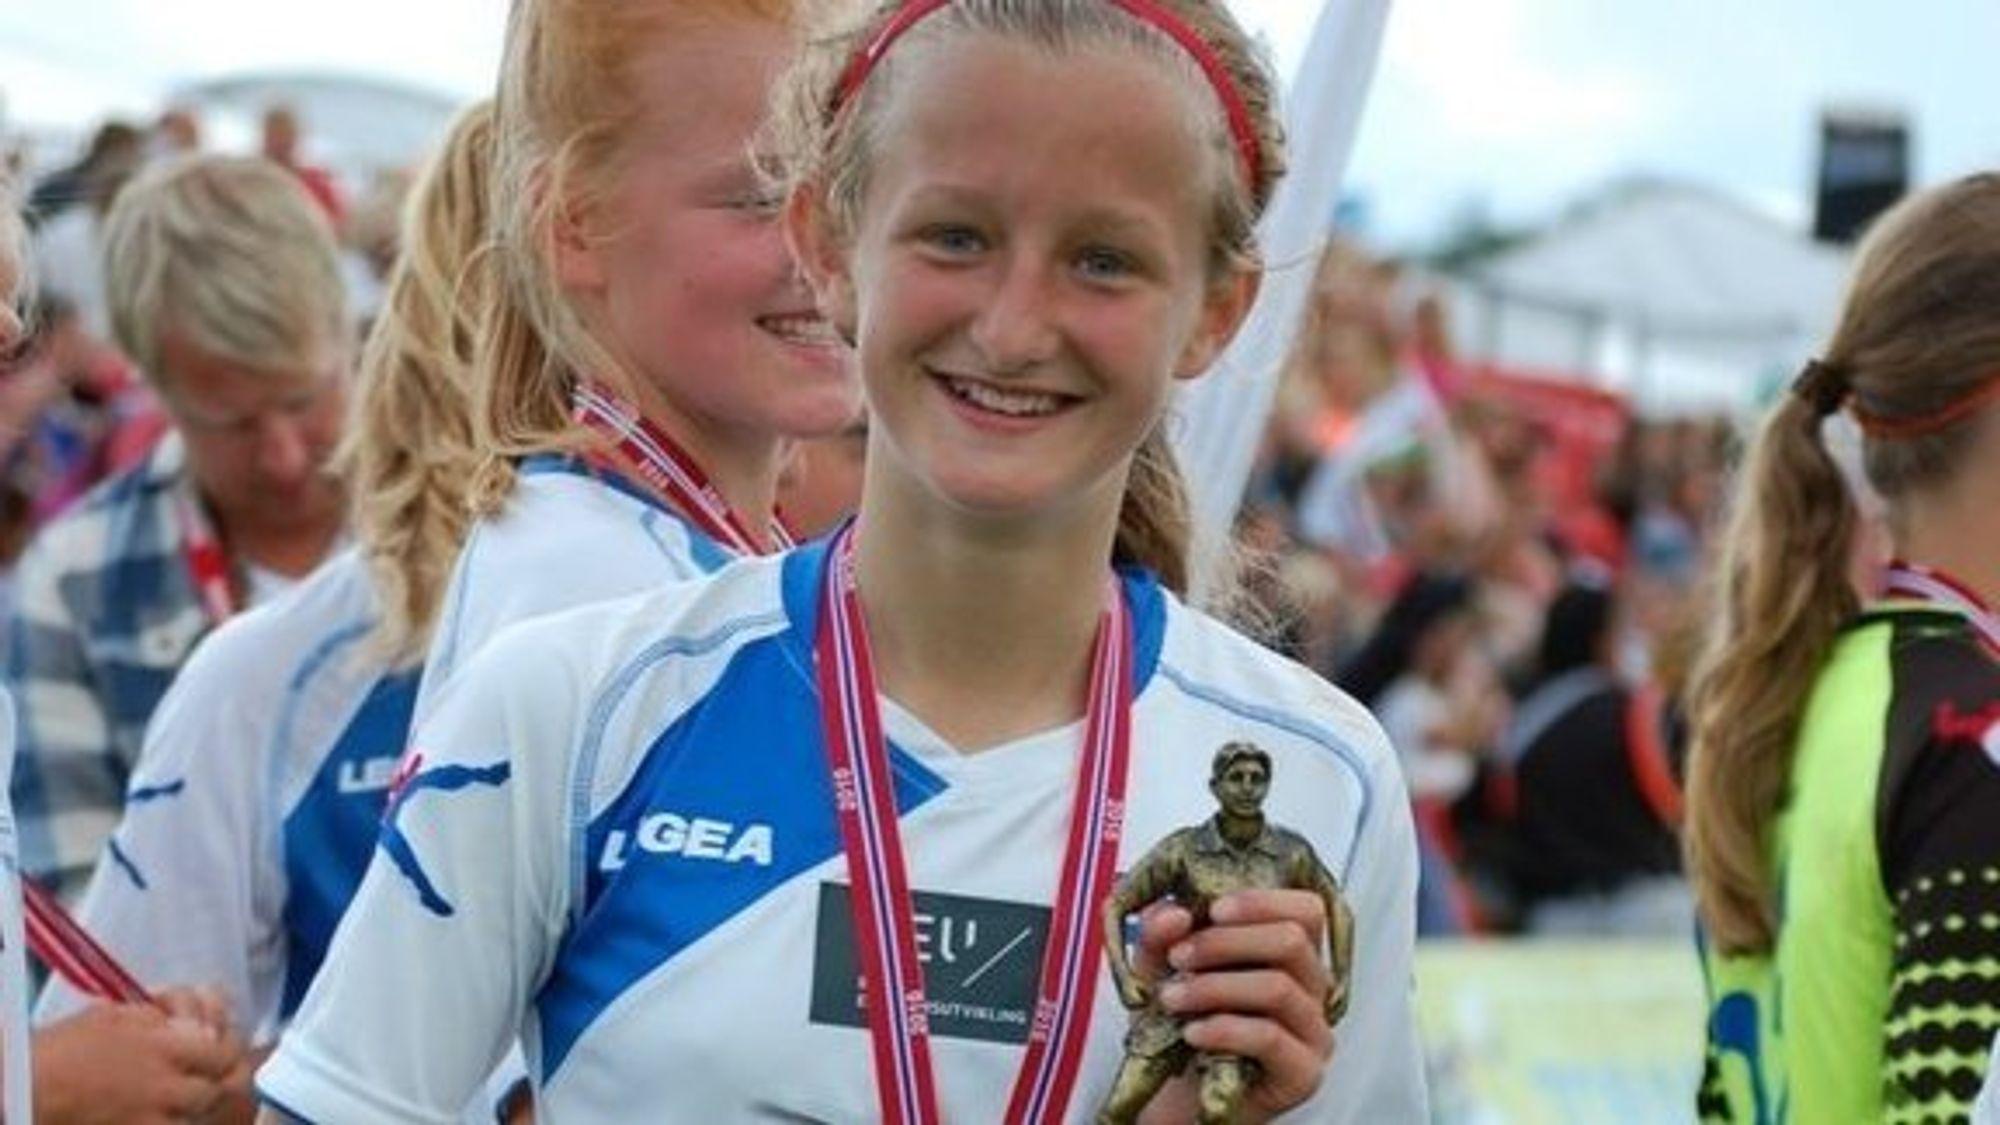 PUTTET FØRST: Guro Møller ga Kolbotn ledelsen i første omgang. Det hjalp på nervene, og J14 tråkket til og vant kvartfinalen!